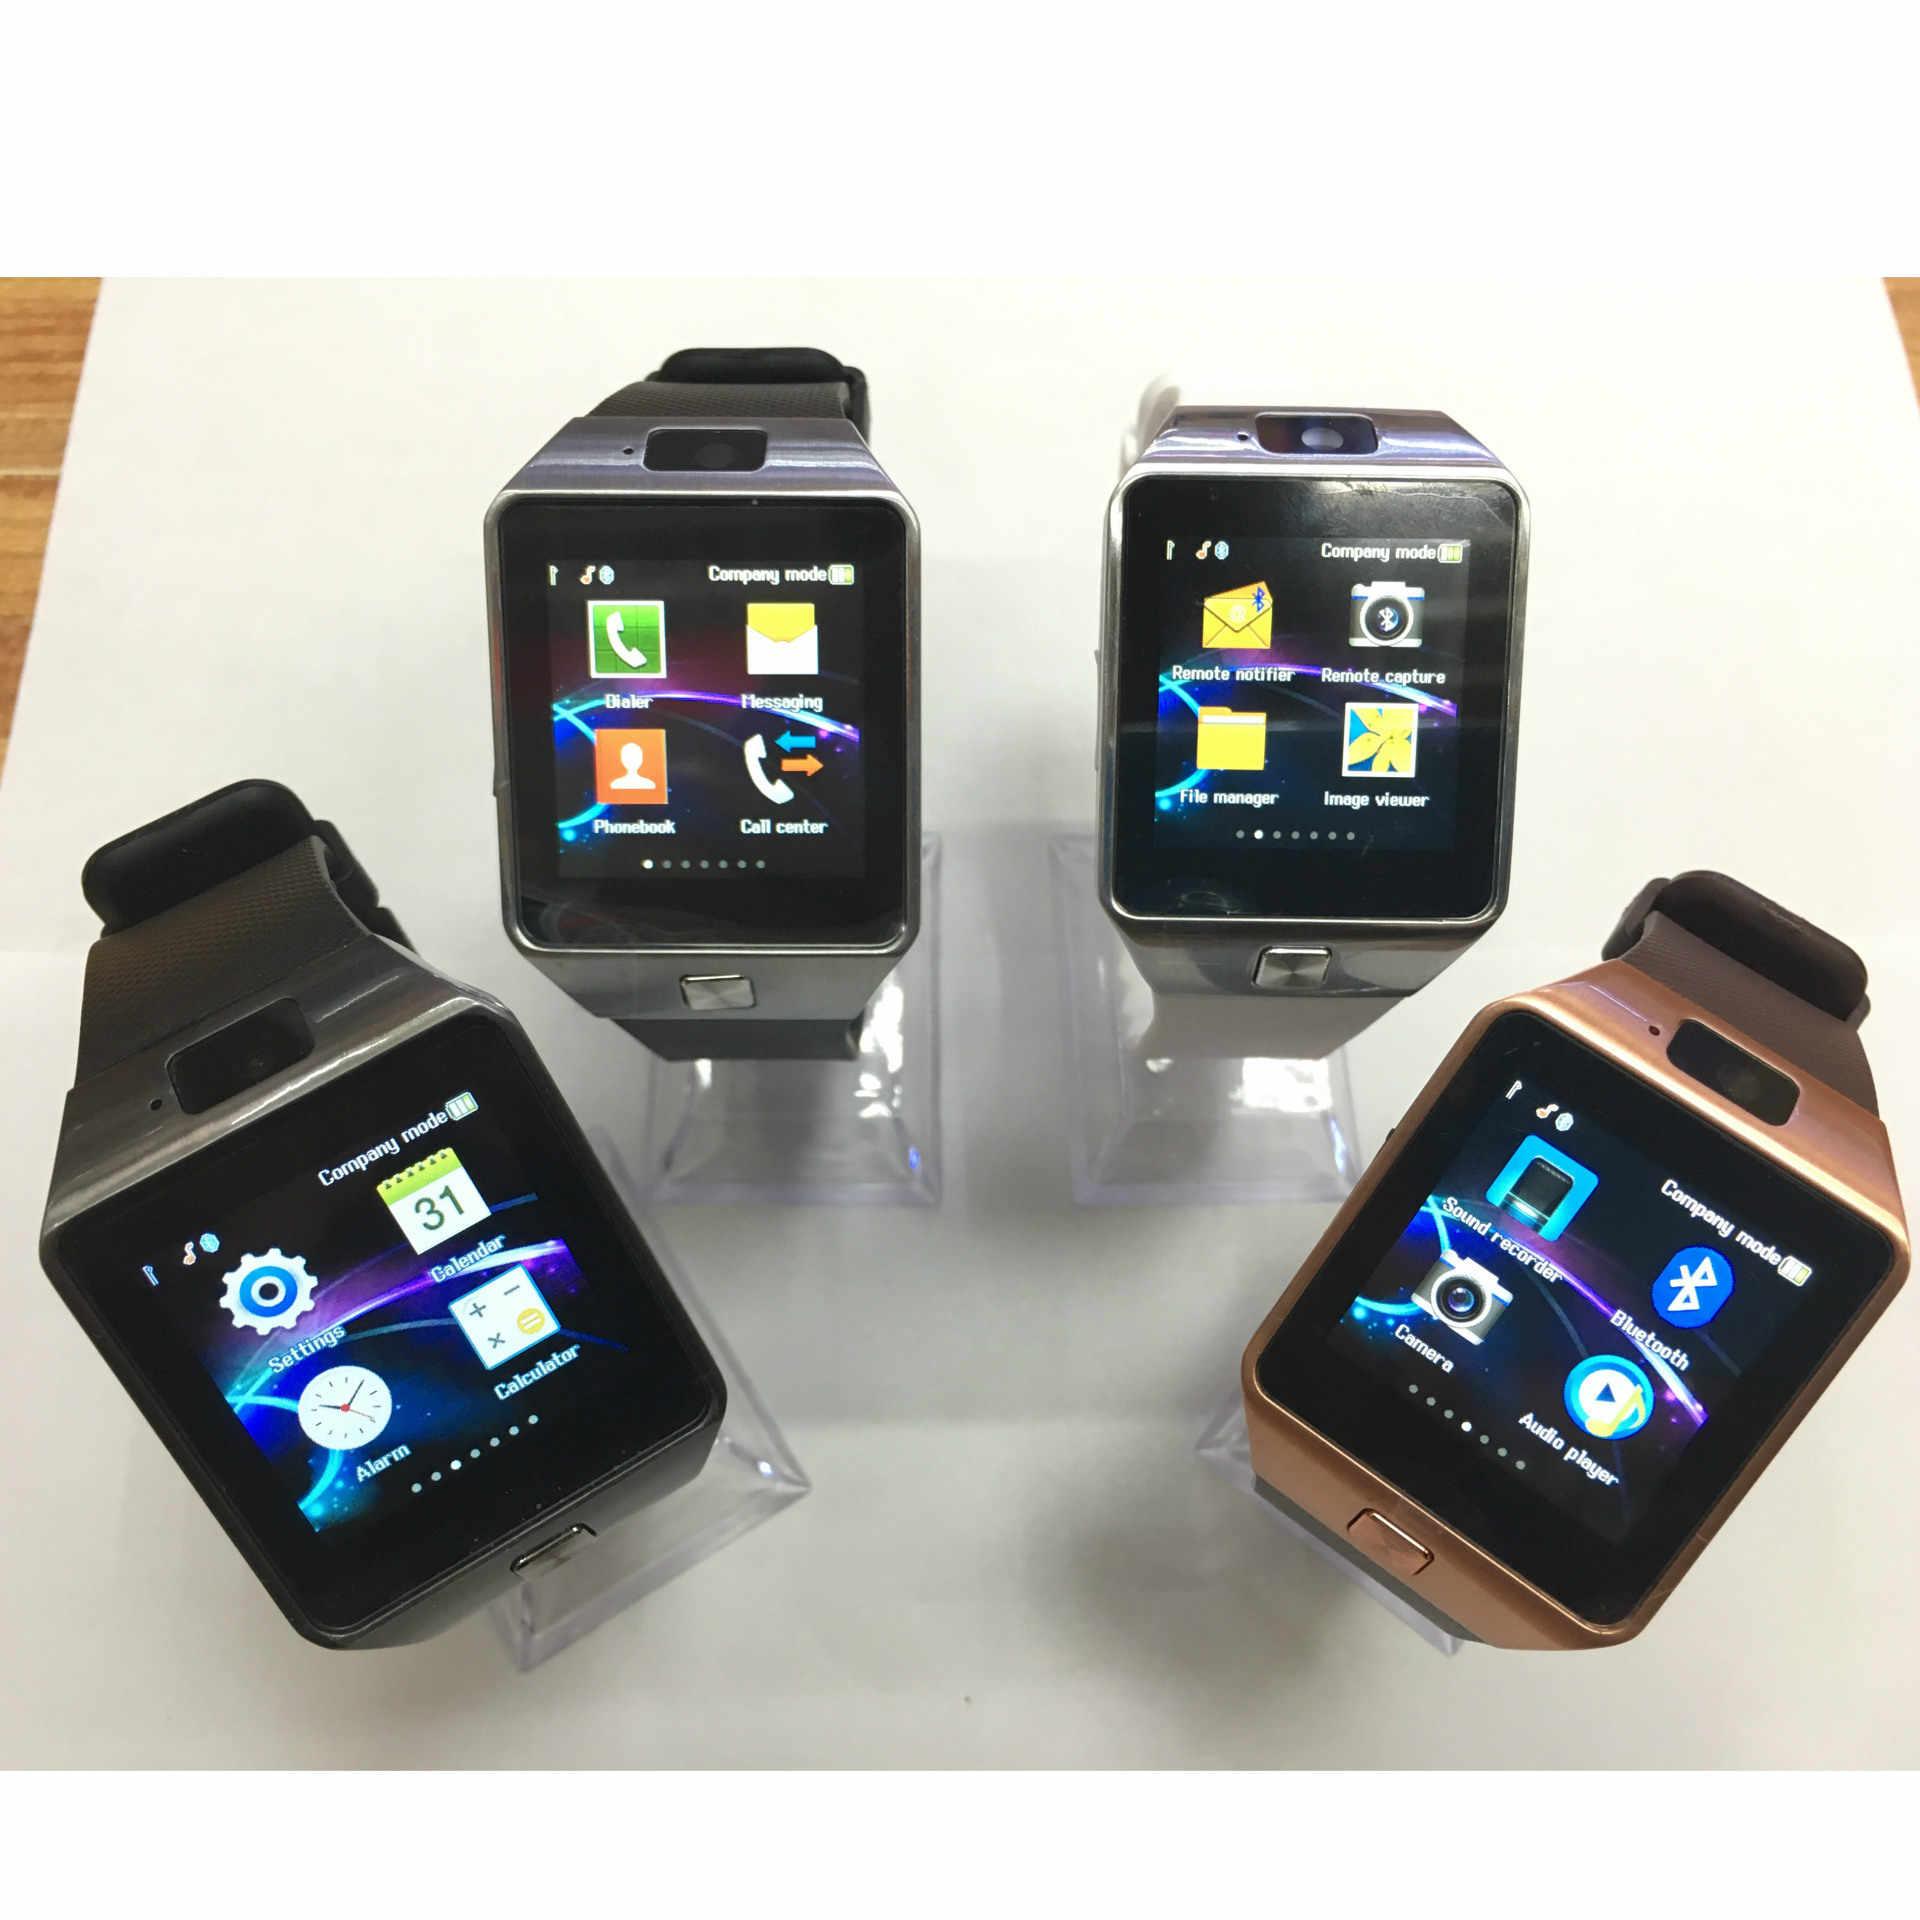 DZ09 بلوتوث ساعة ذكية Smartwatch TF سيم كاميرا الرجال النساء ساعة يد رياضية لسامسونج هواوي شاومي أندرويد الهاتف PK A1 Z60